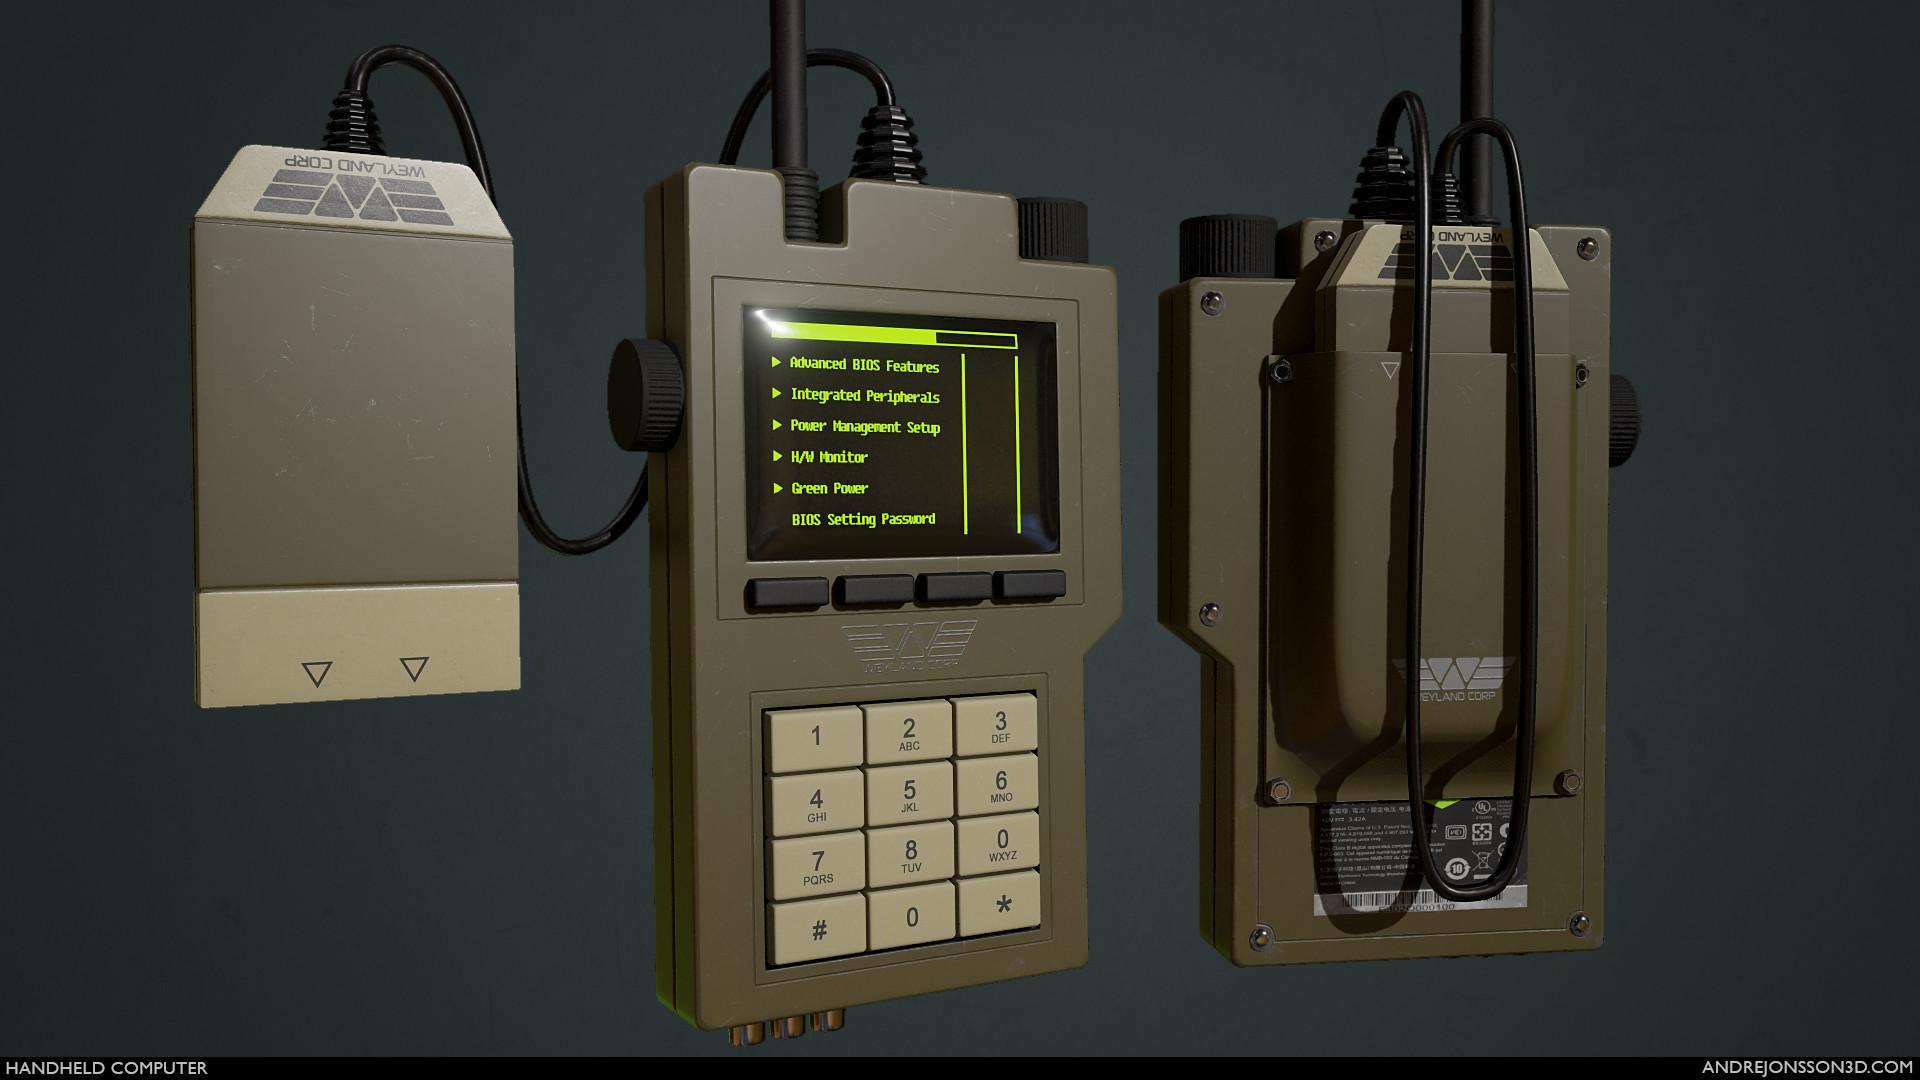 Andre jonsson handheld computer 01